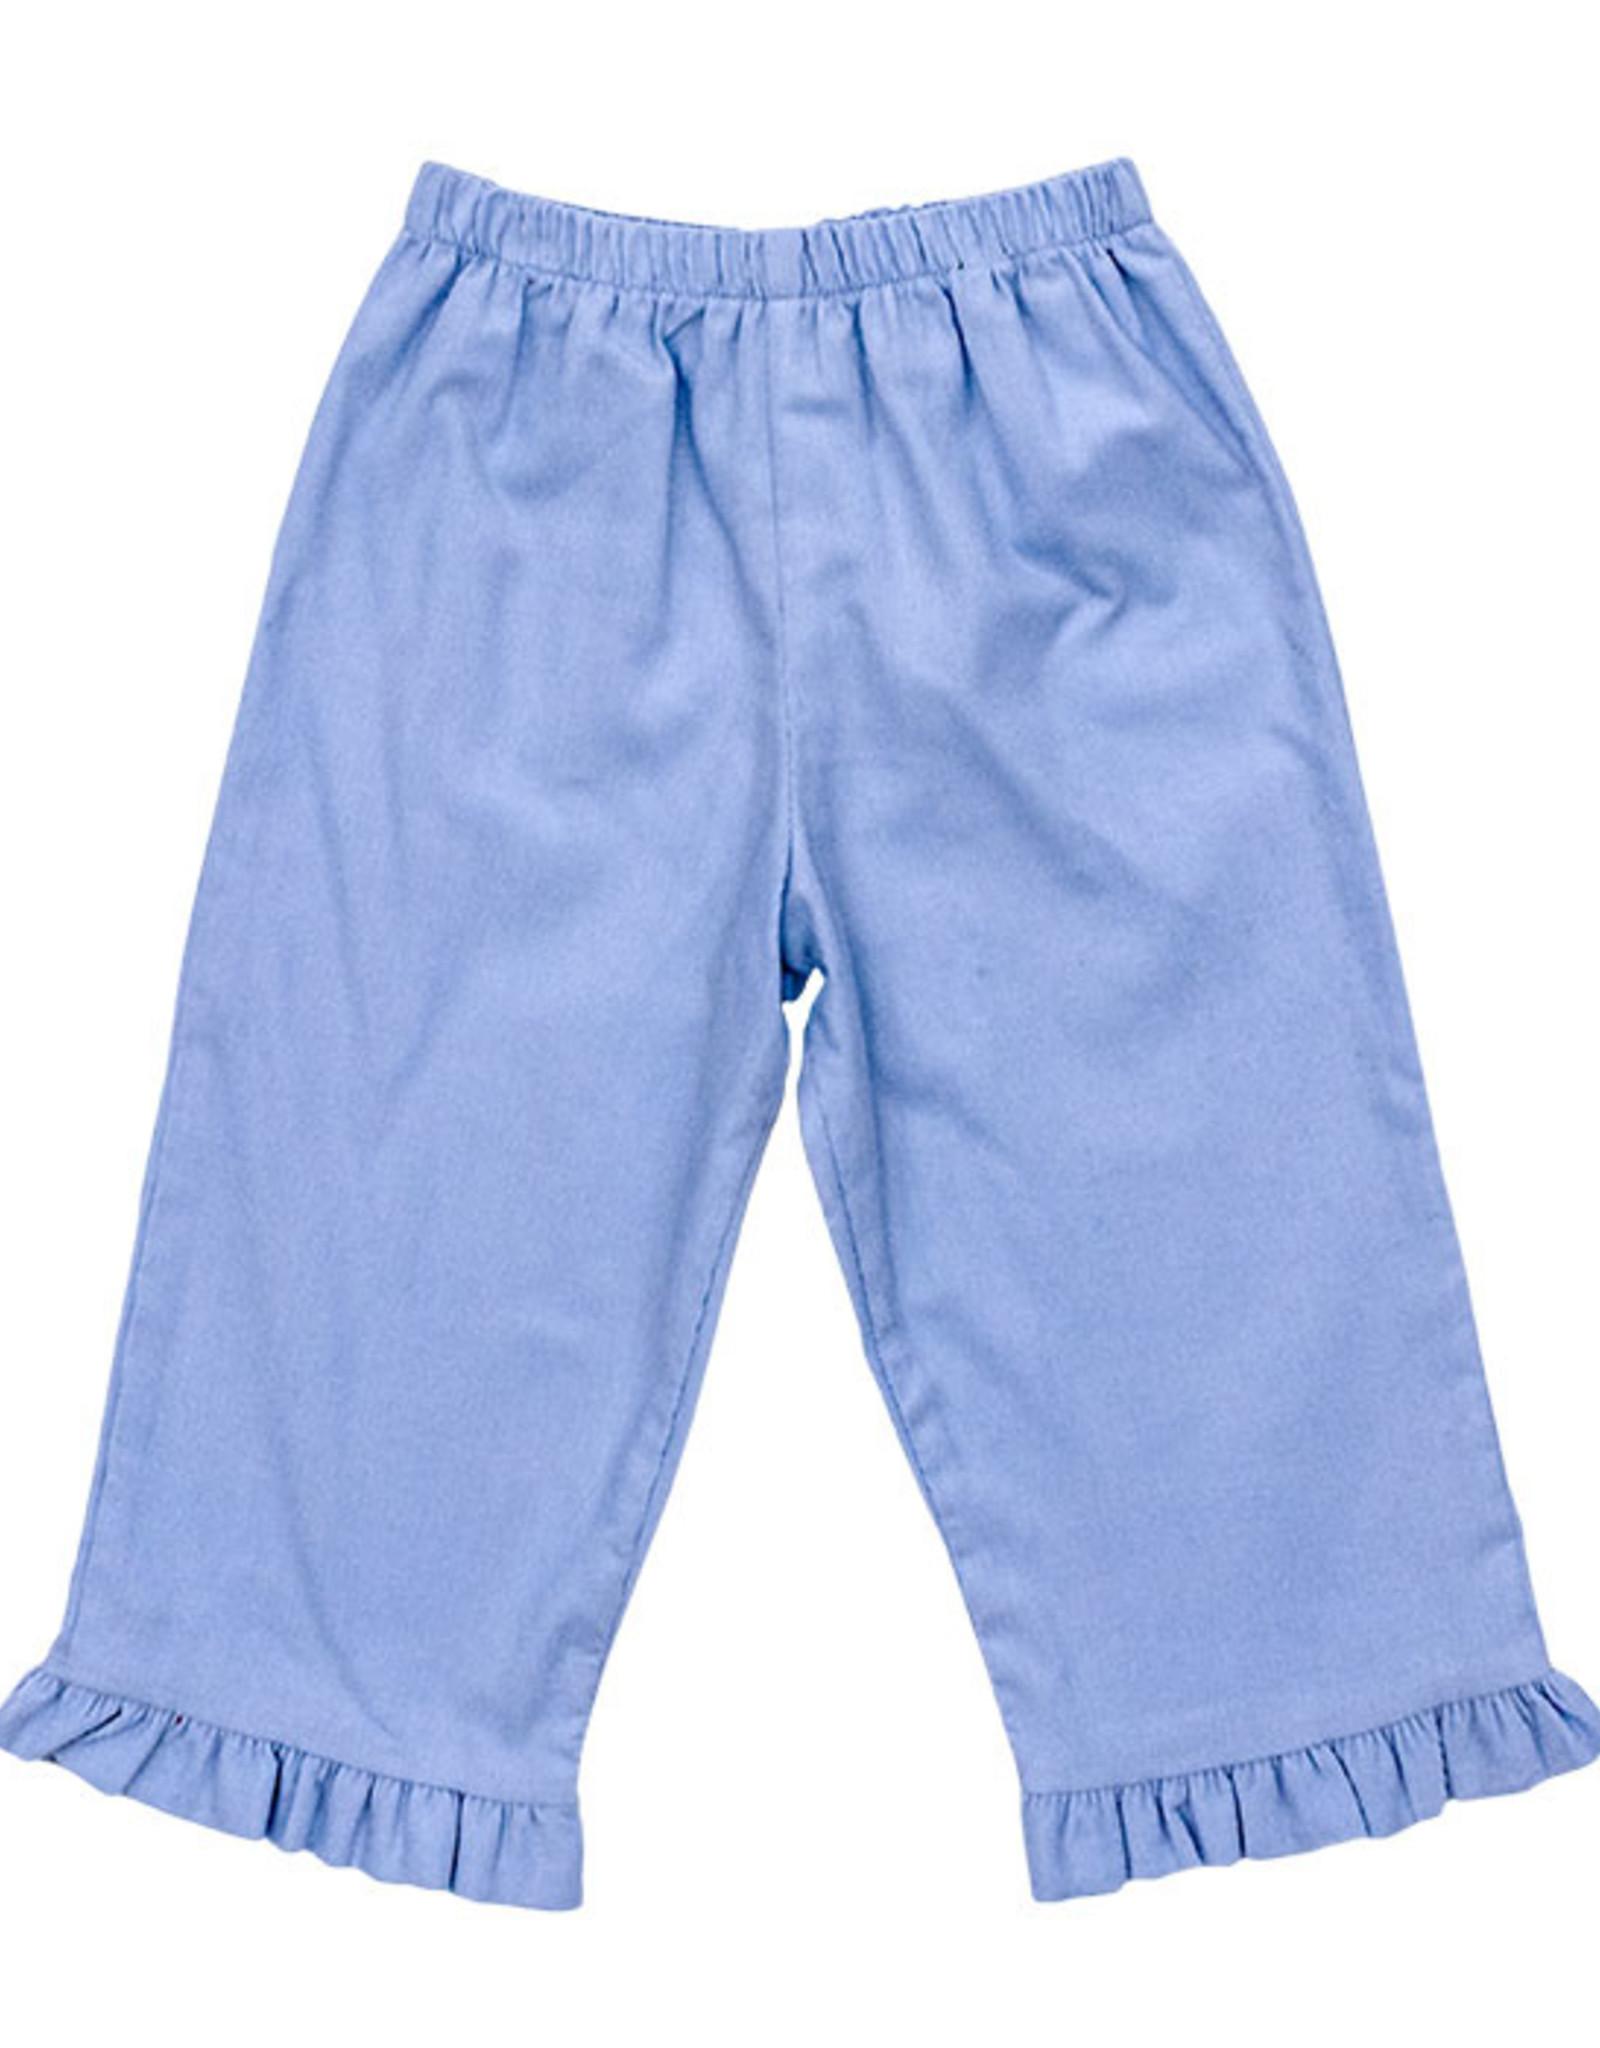 The Bailey Boys Light Blue Elastic Cord Pants With Ruffle